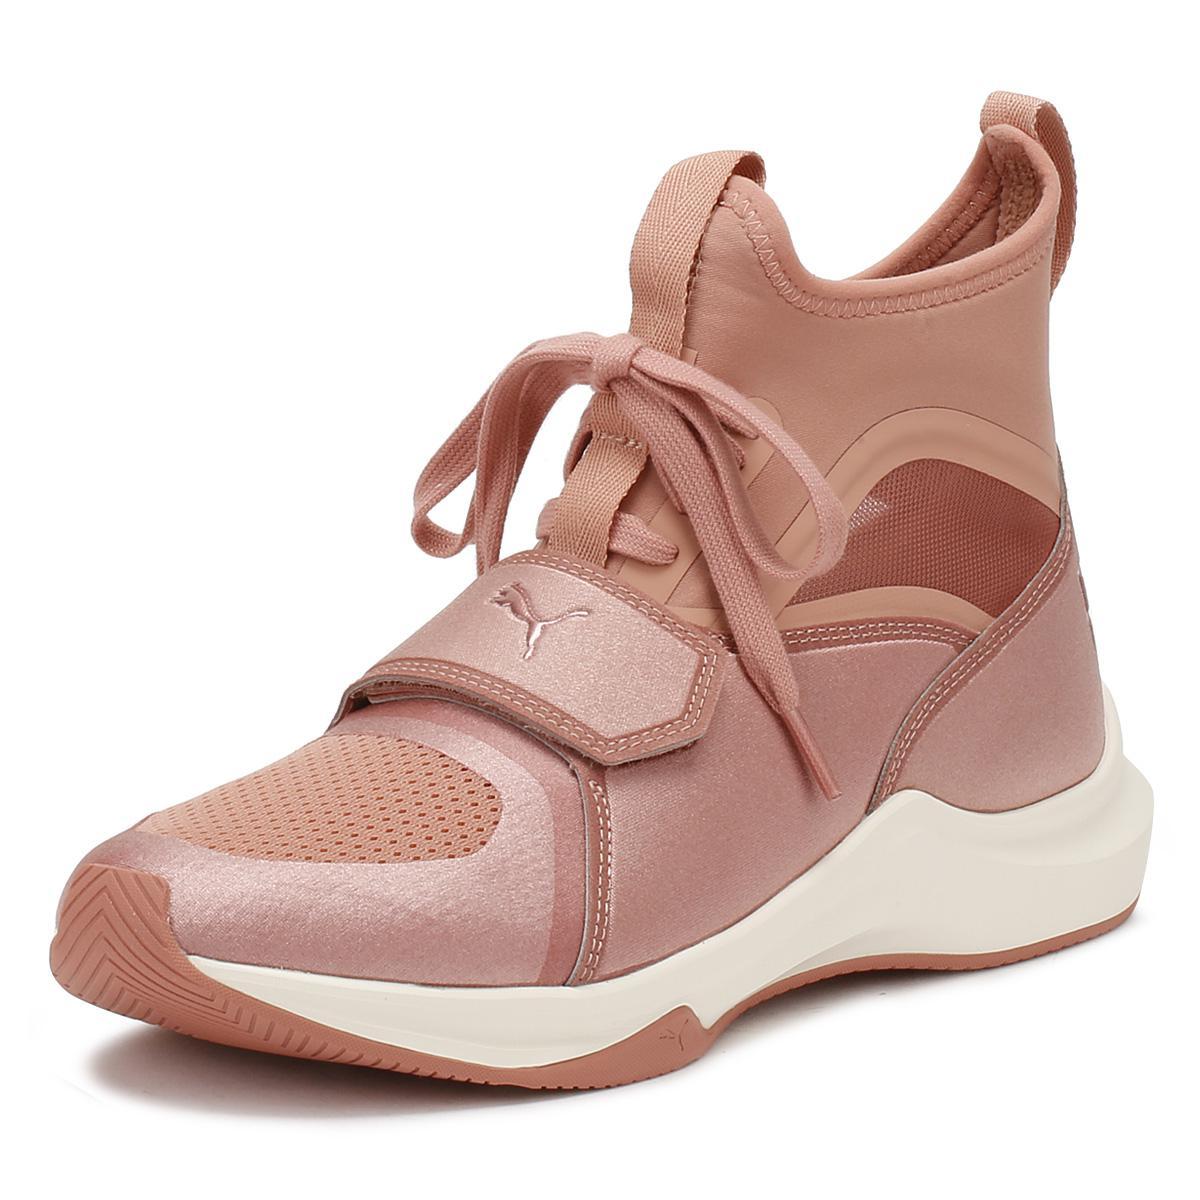 660eae24e1fb PUMA - Womens Selena Gomez Pink Phenom Trainers Women s Shoes (high-top  Trainers). View fullscreen